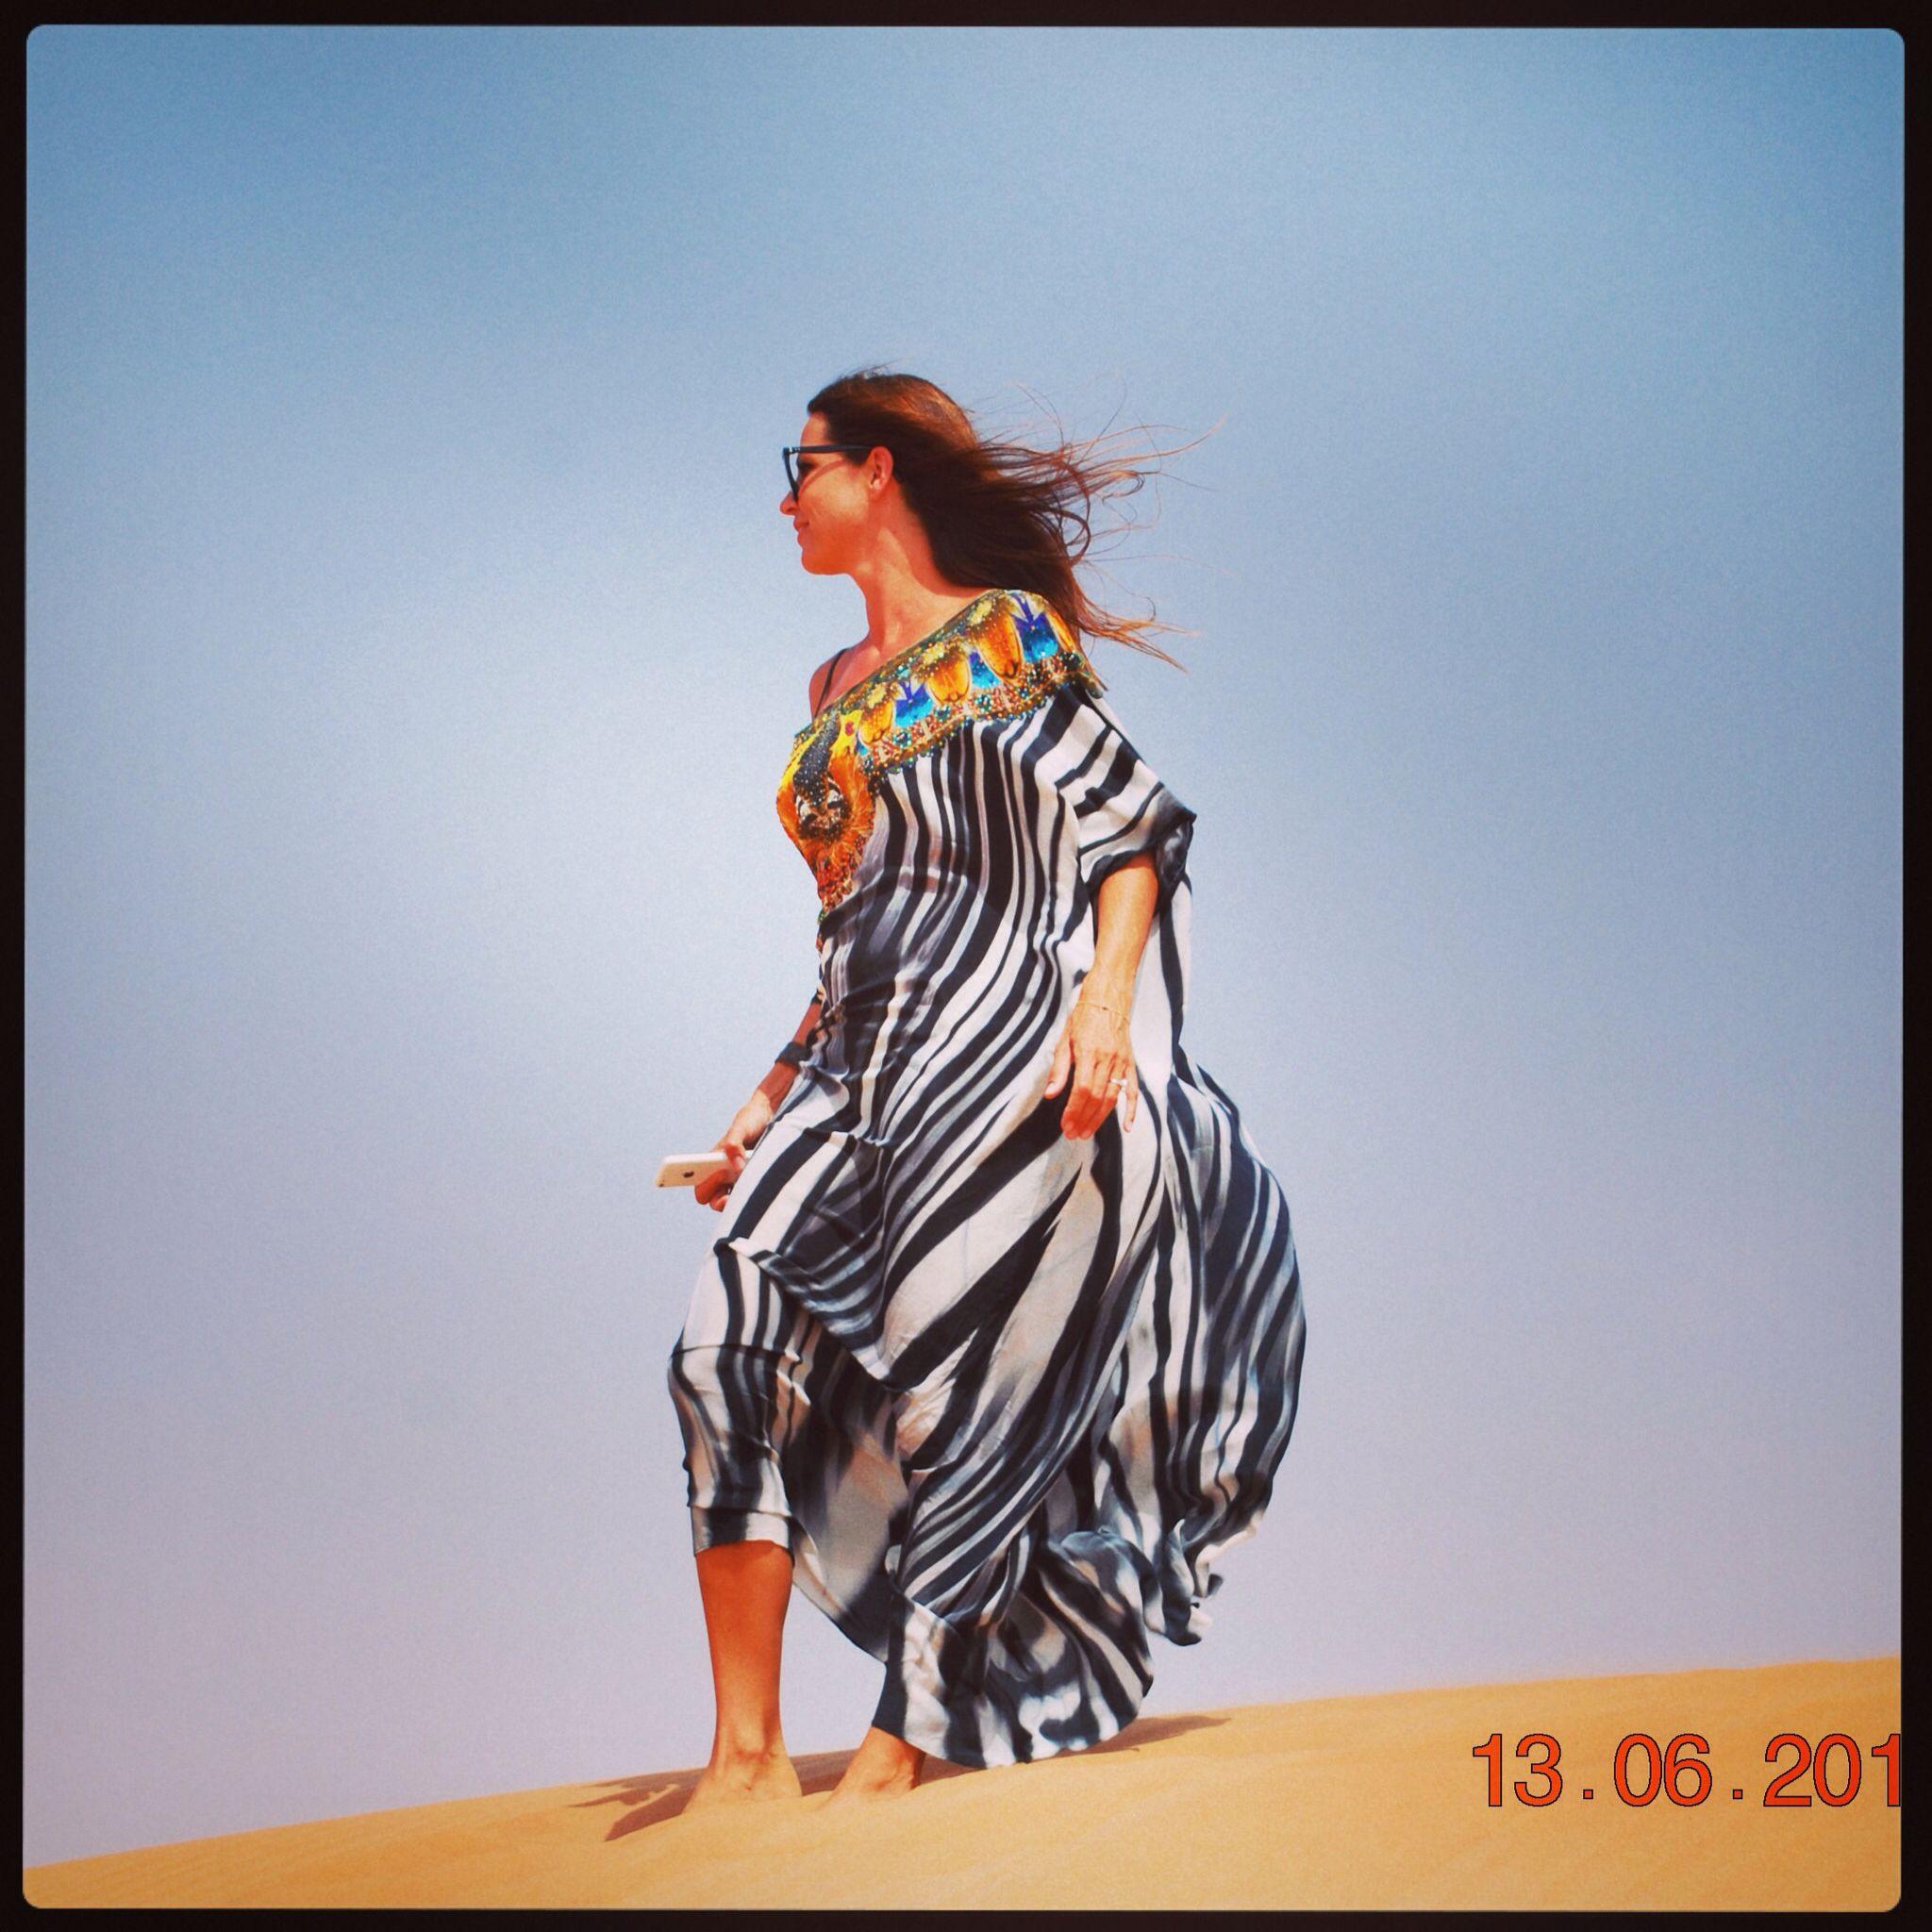 167bbb54abc Camilla kaftan in the Dubai desert